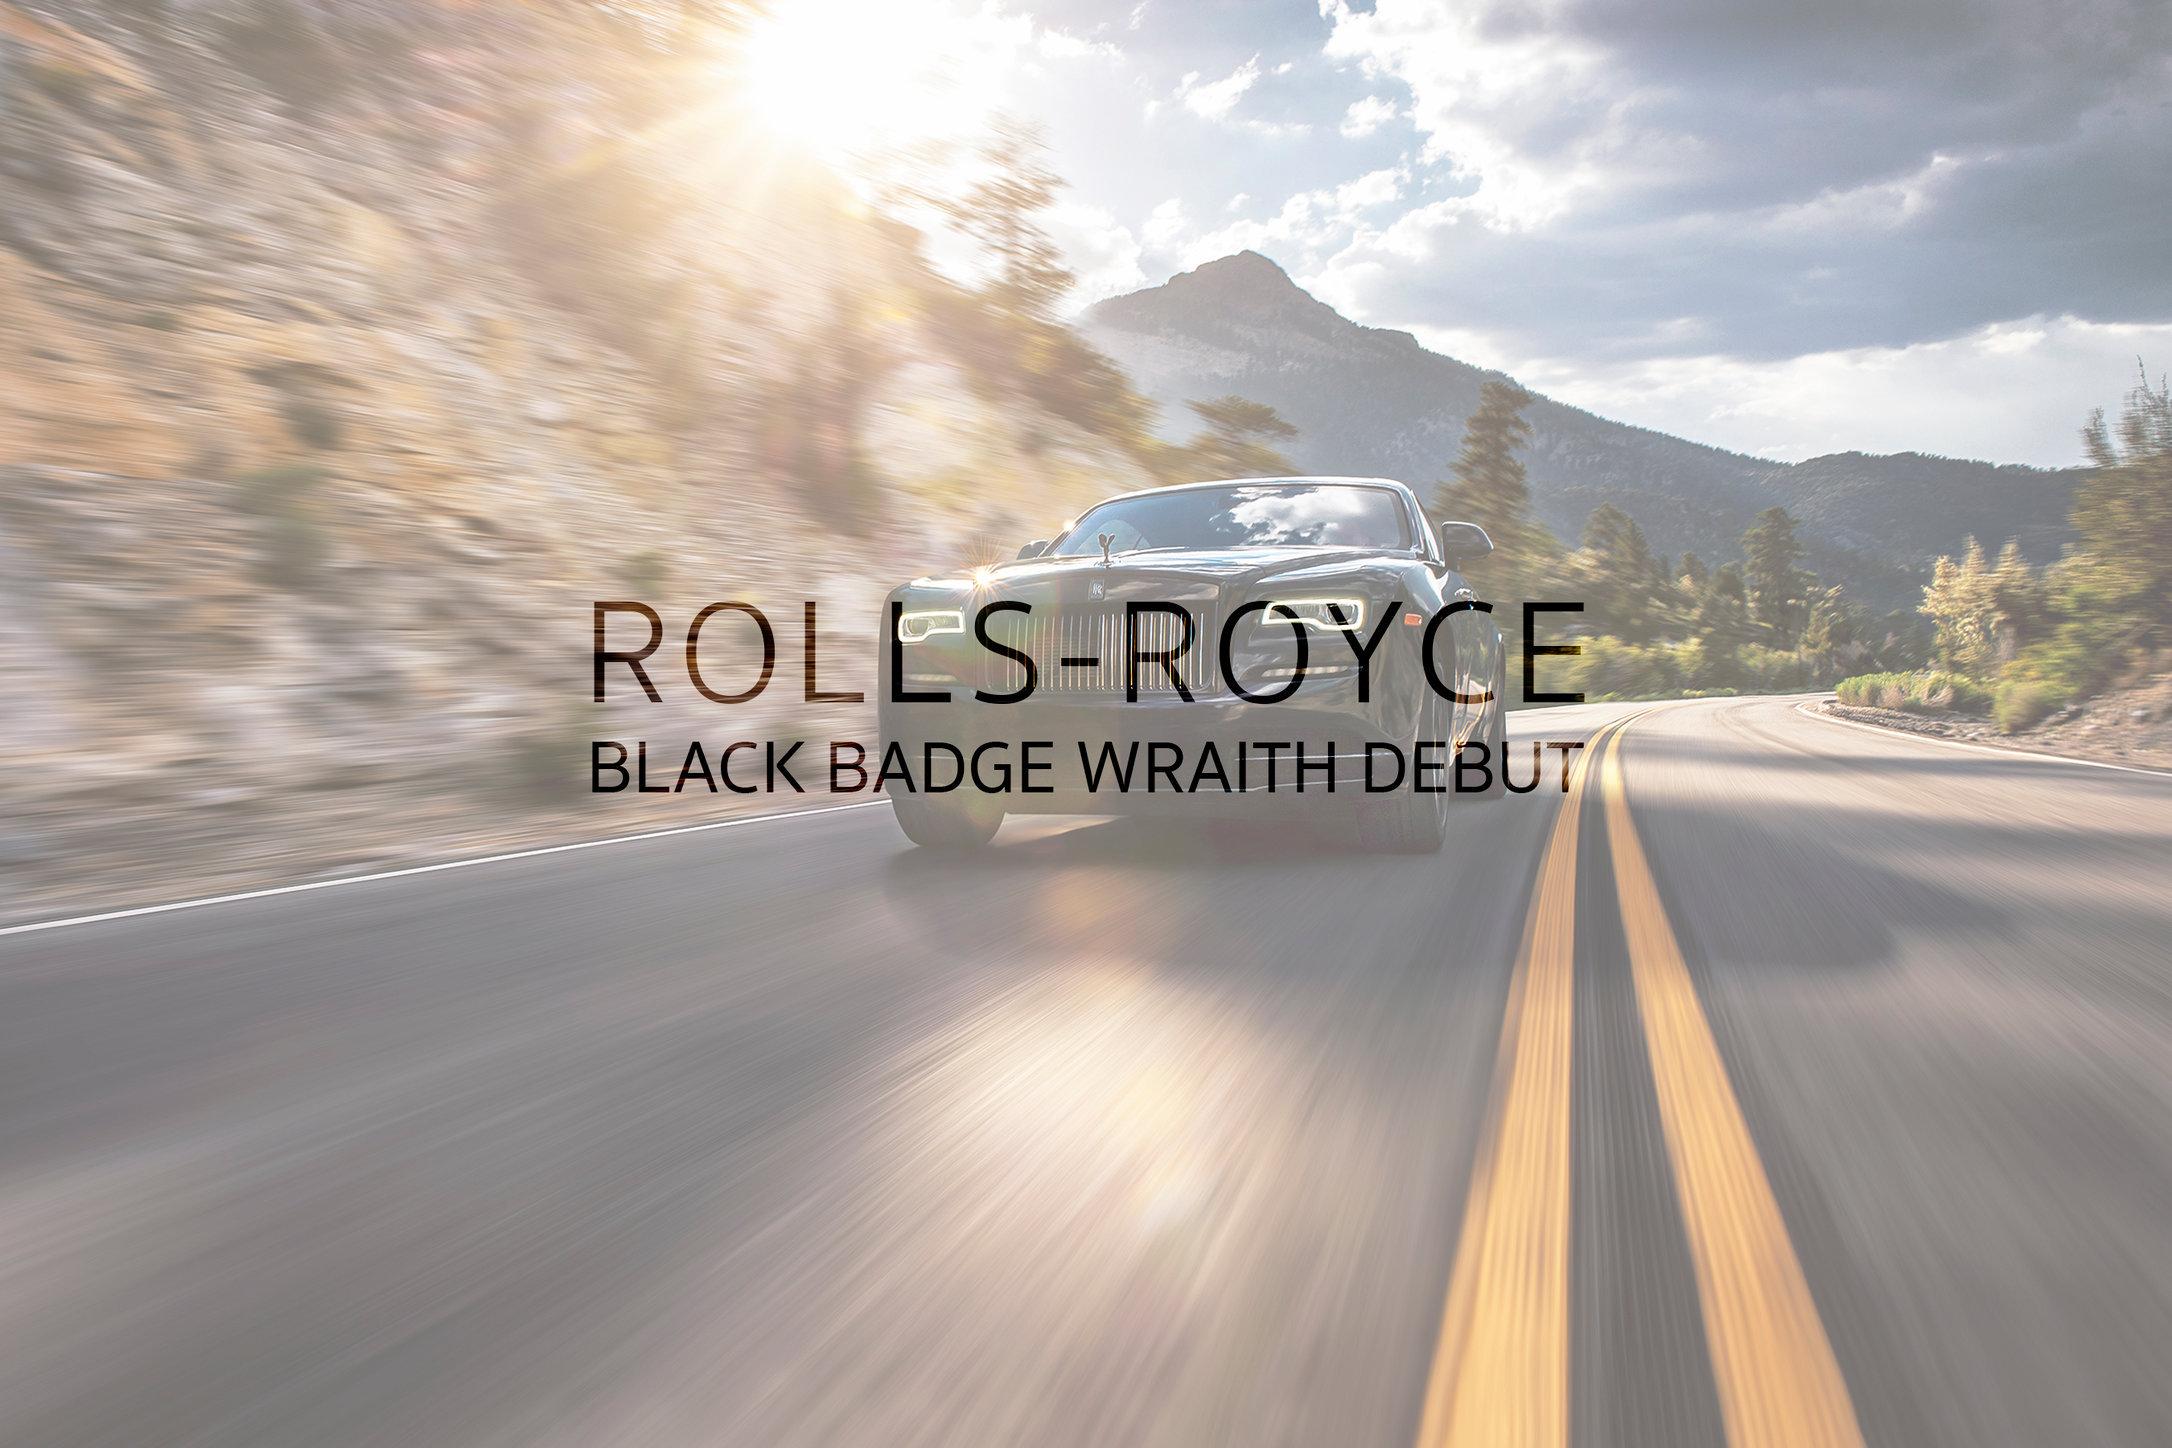 rolls royce cover 2.jpg